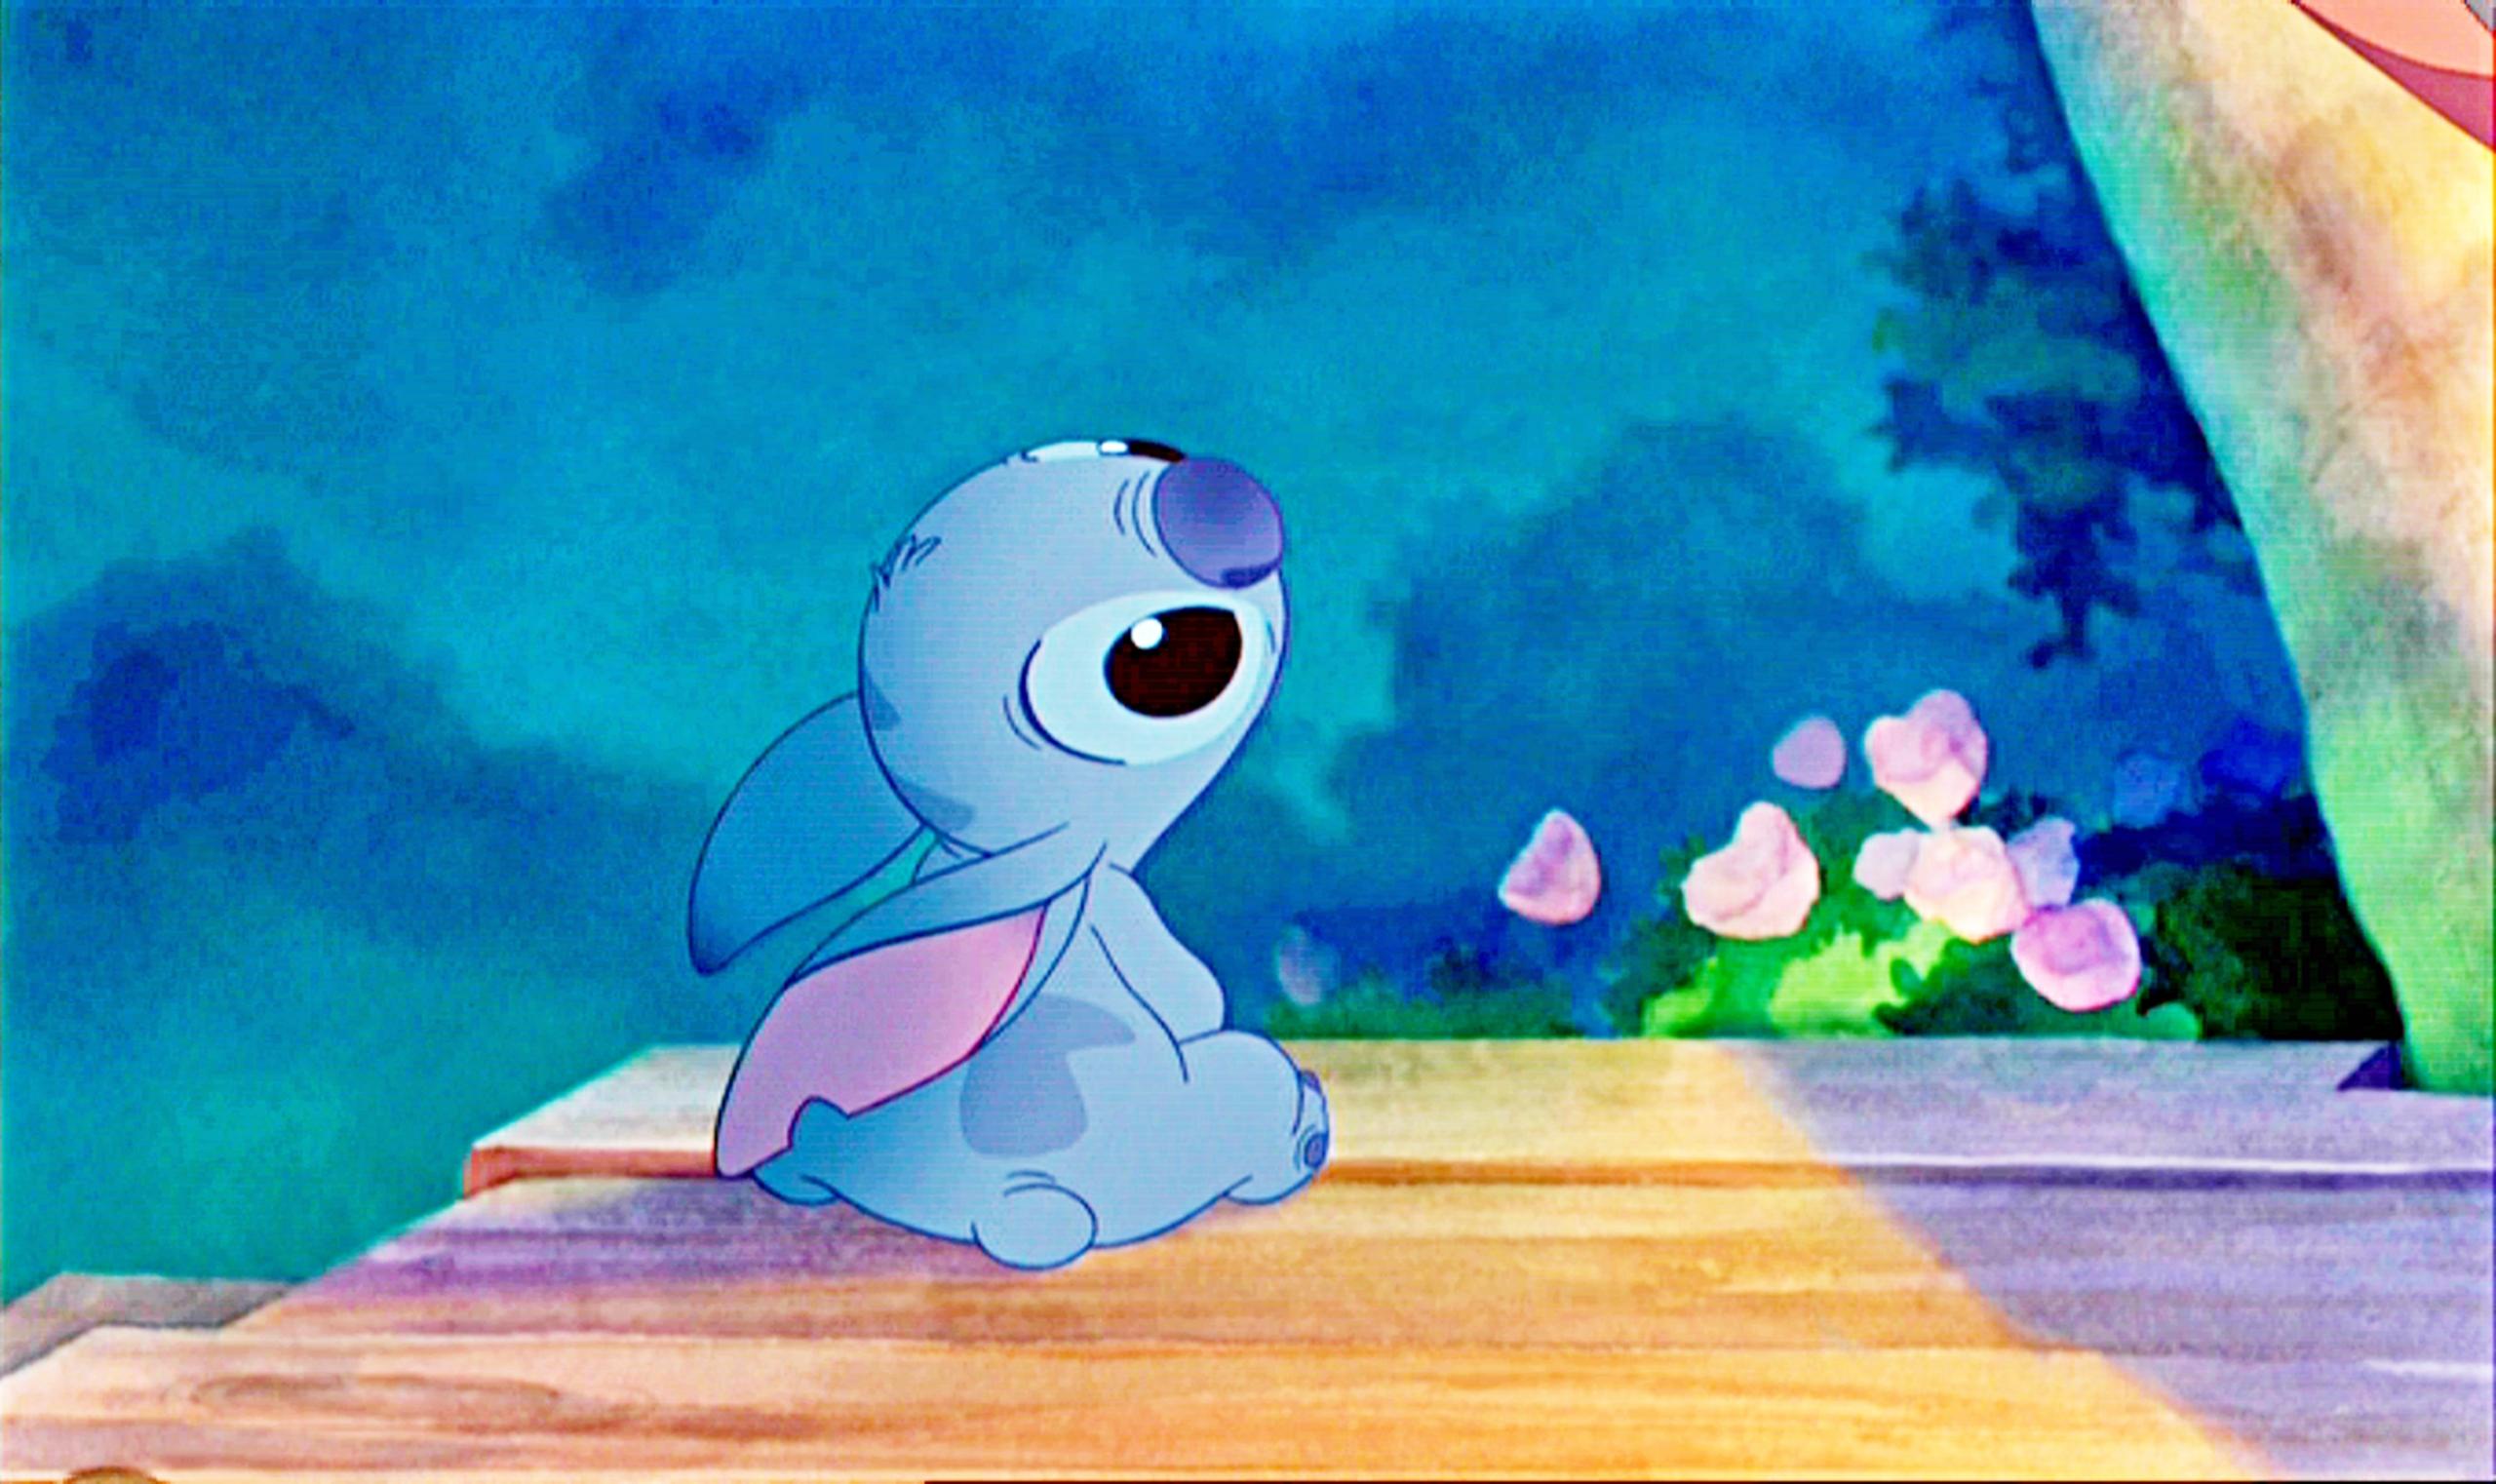 Walt Disney Screencaps Stitch walt disney characters 28621209 2560 2560x1522